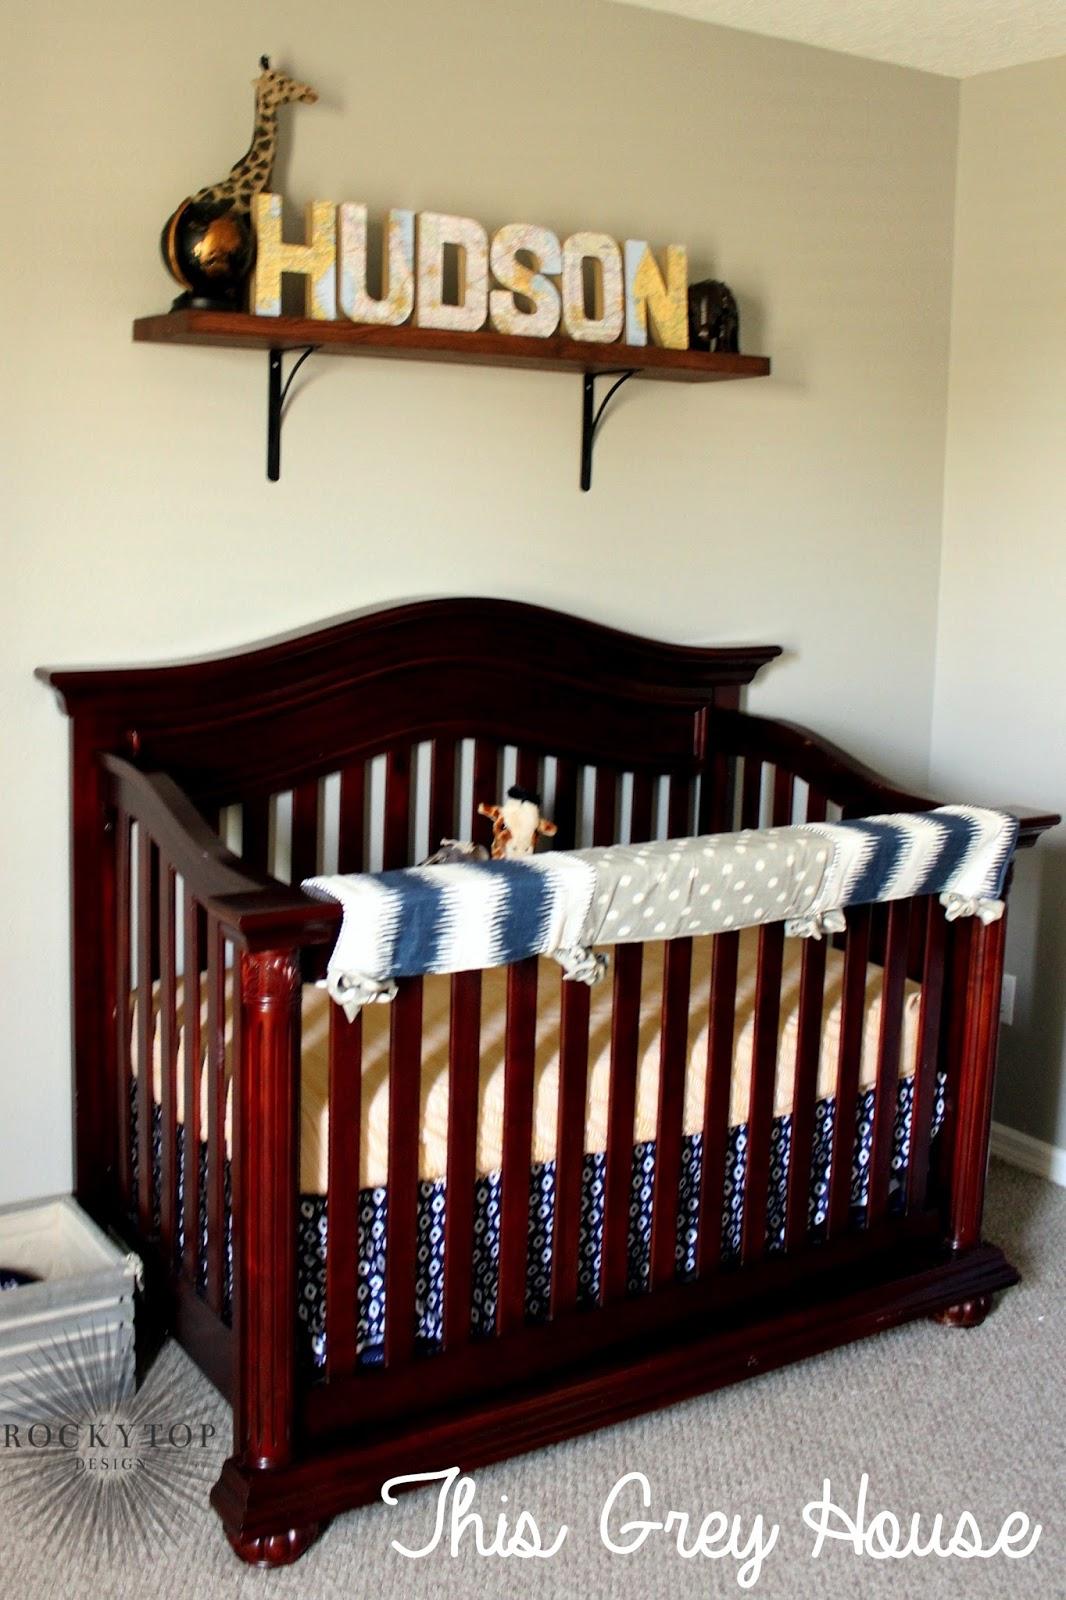 Nursery Design Trends Advice From Celebrity Designer: Design With Altitude: Current Nursery Design Trends